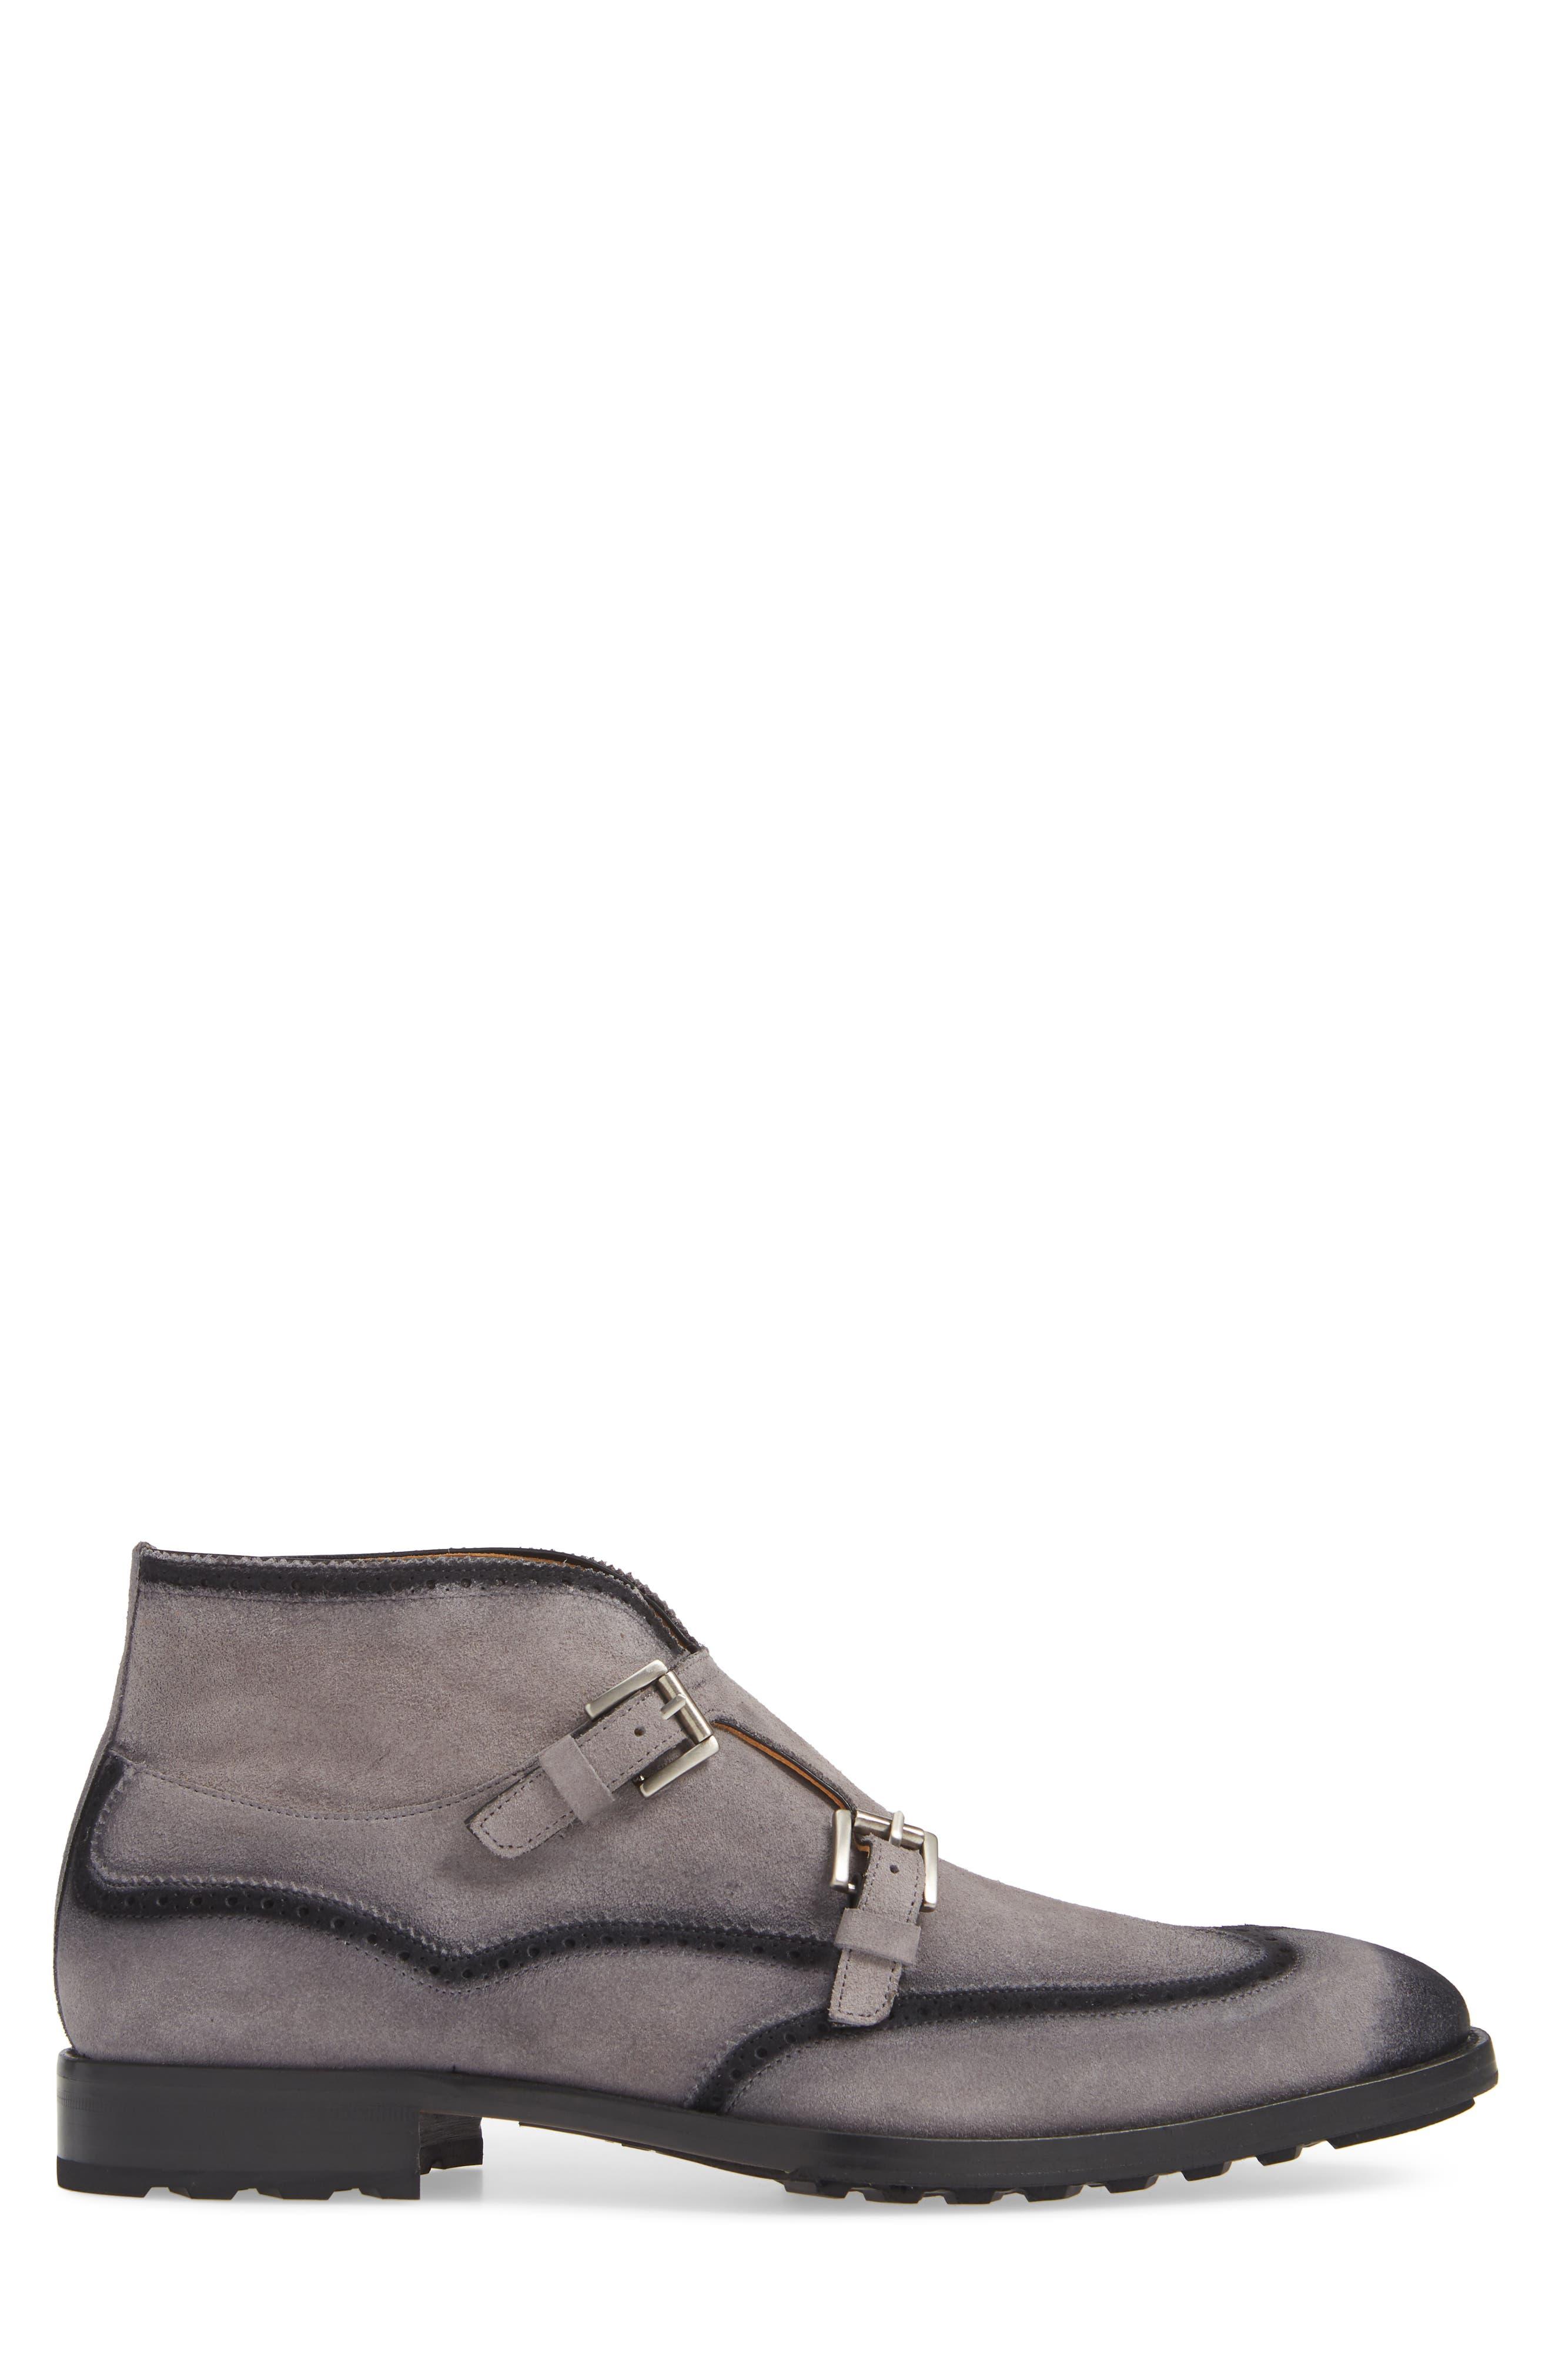 Munoz Double Monk Strap Boot,                             Alternate thumbnail 3, color,                             GREY SUEDE